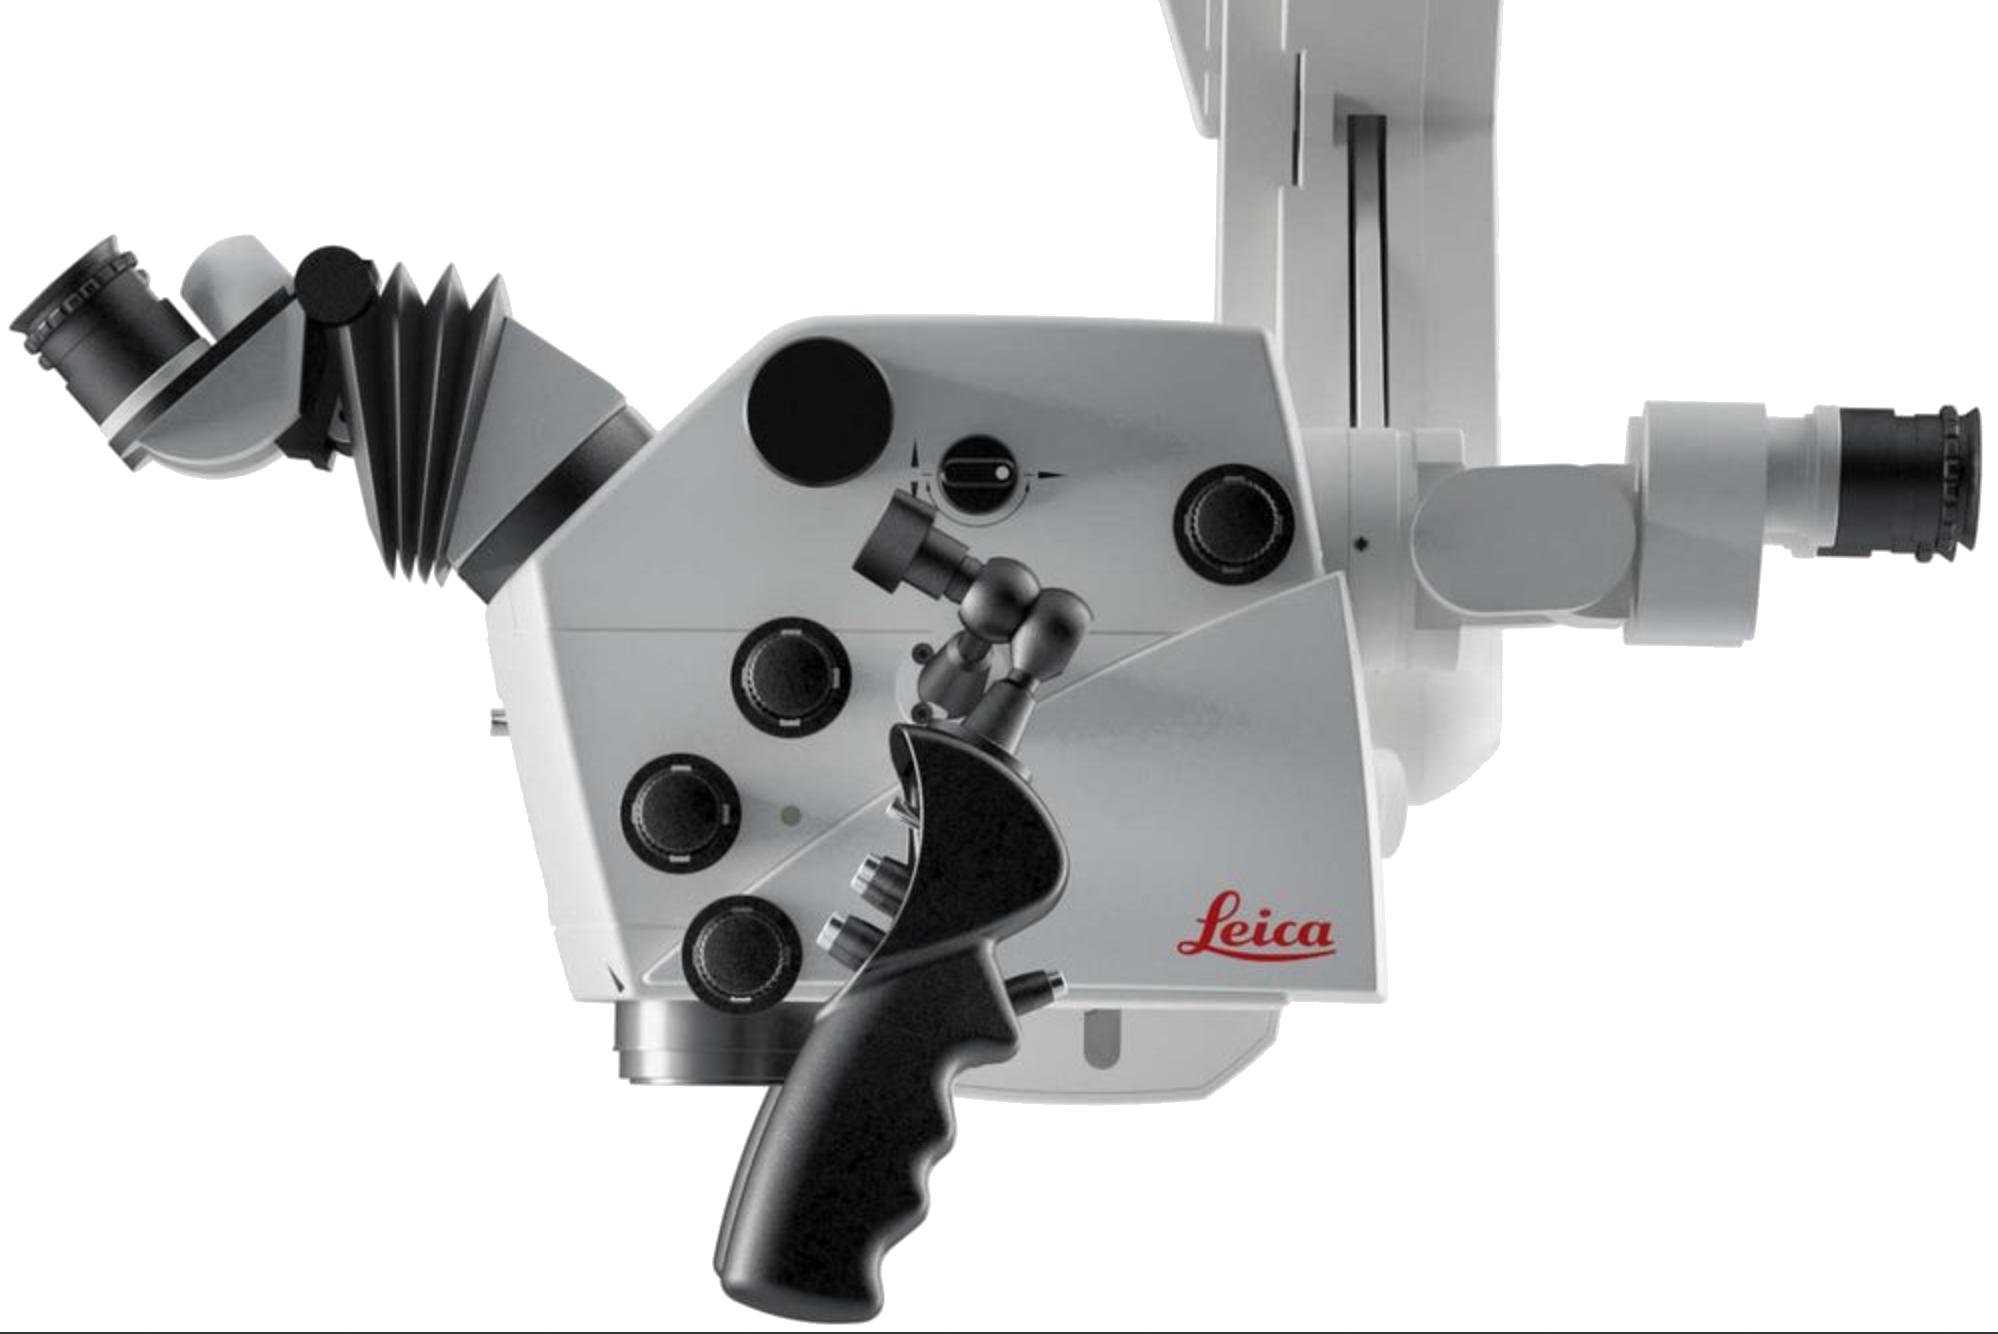 Leica Operasjonsmikroskop